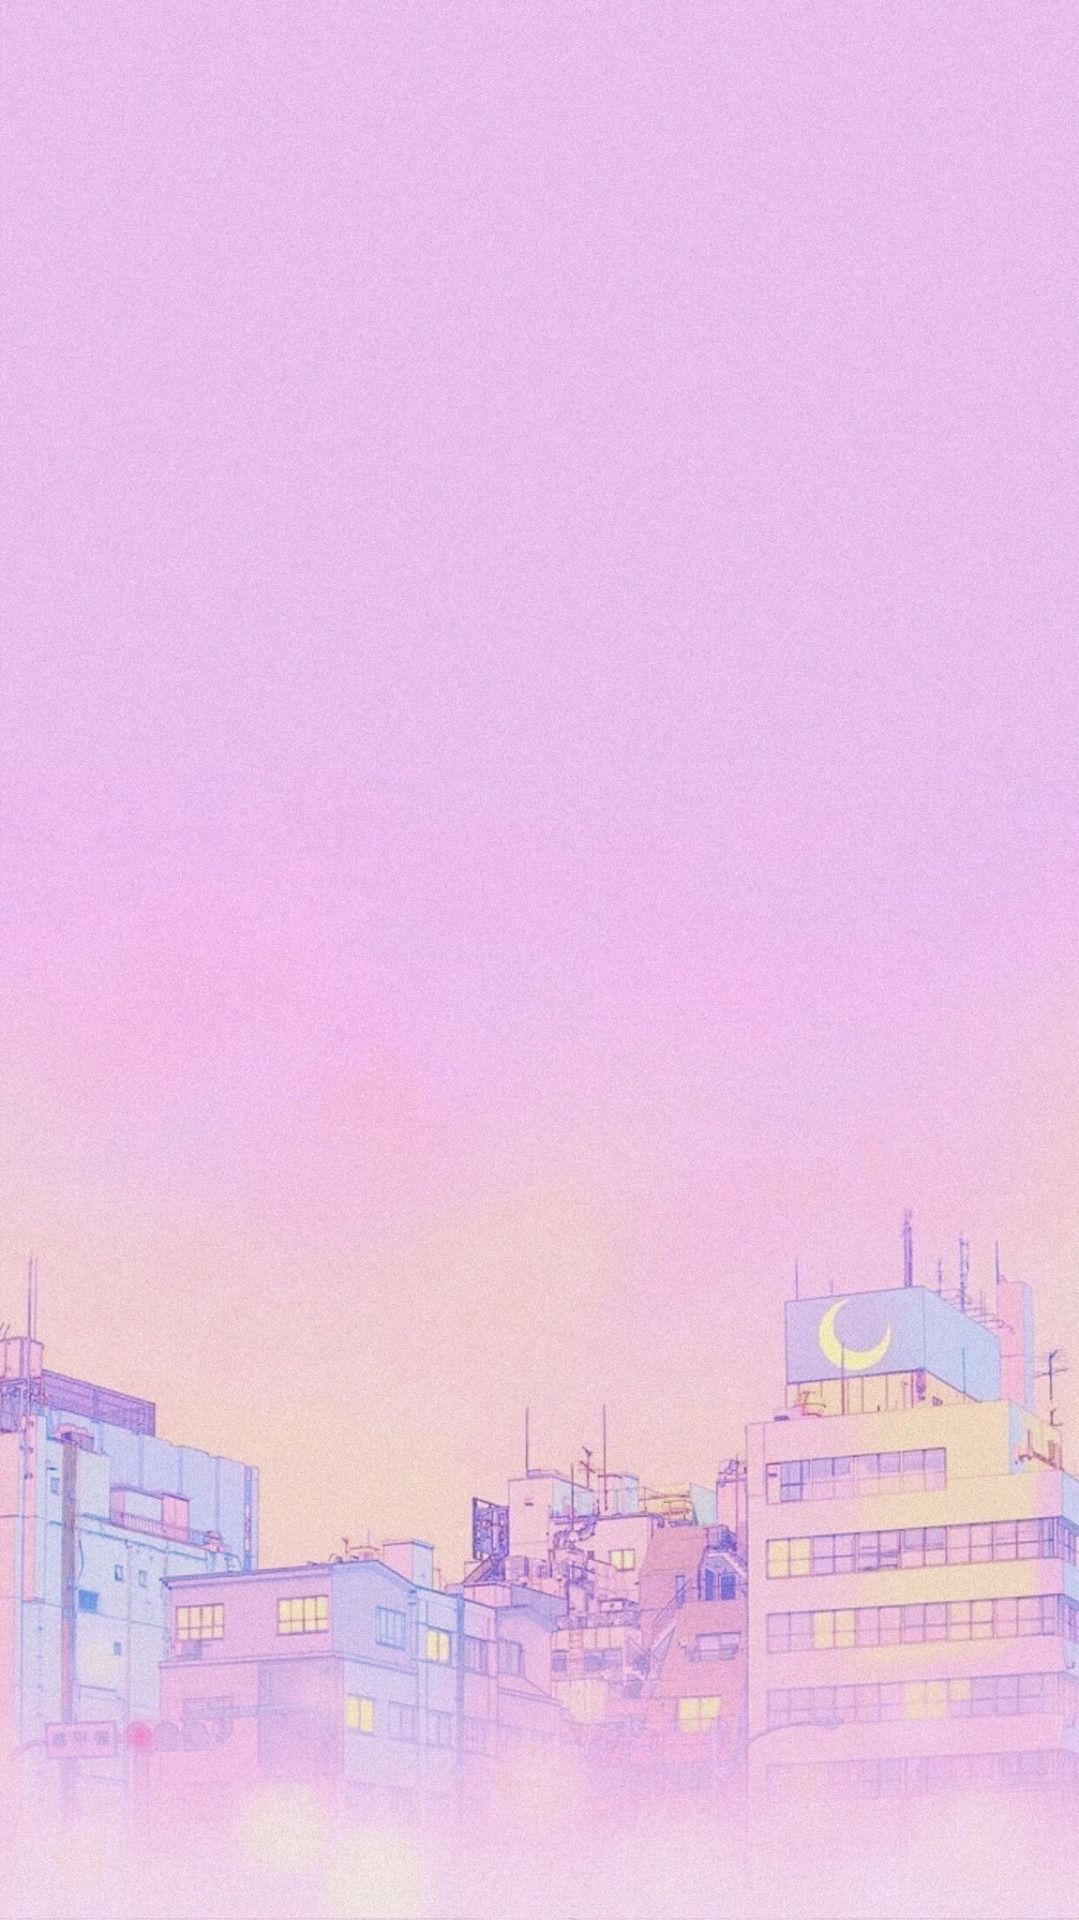 Pin By Ig 980817 On Waℓℓrareyaѕ Anime Wallpaper Iphone Kawaii Wallpaper Cute Pastel Wallpaper